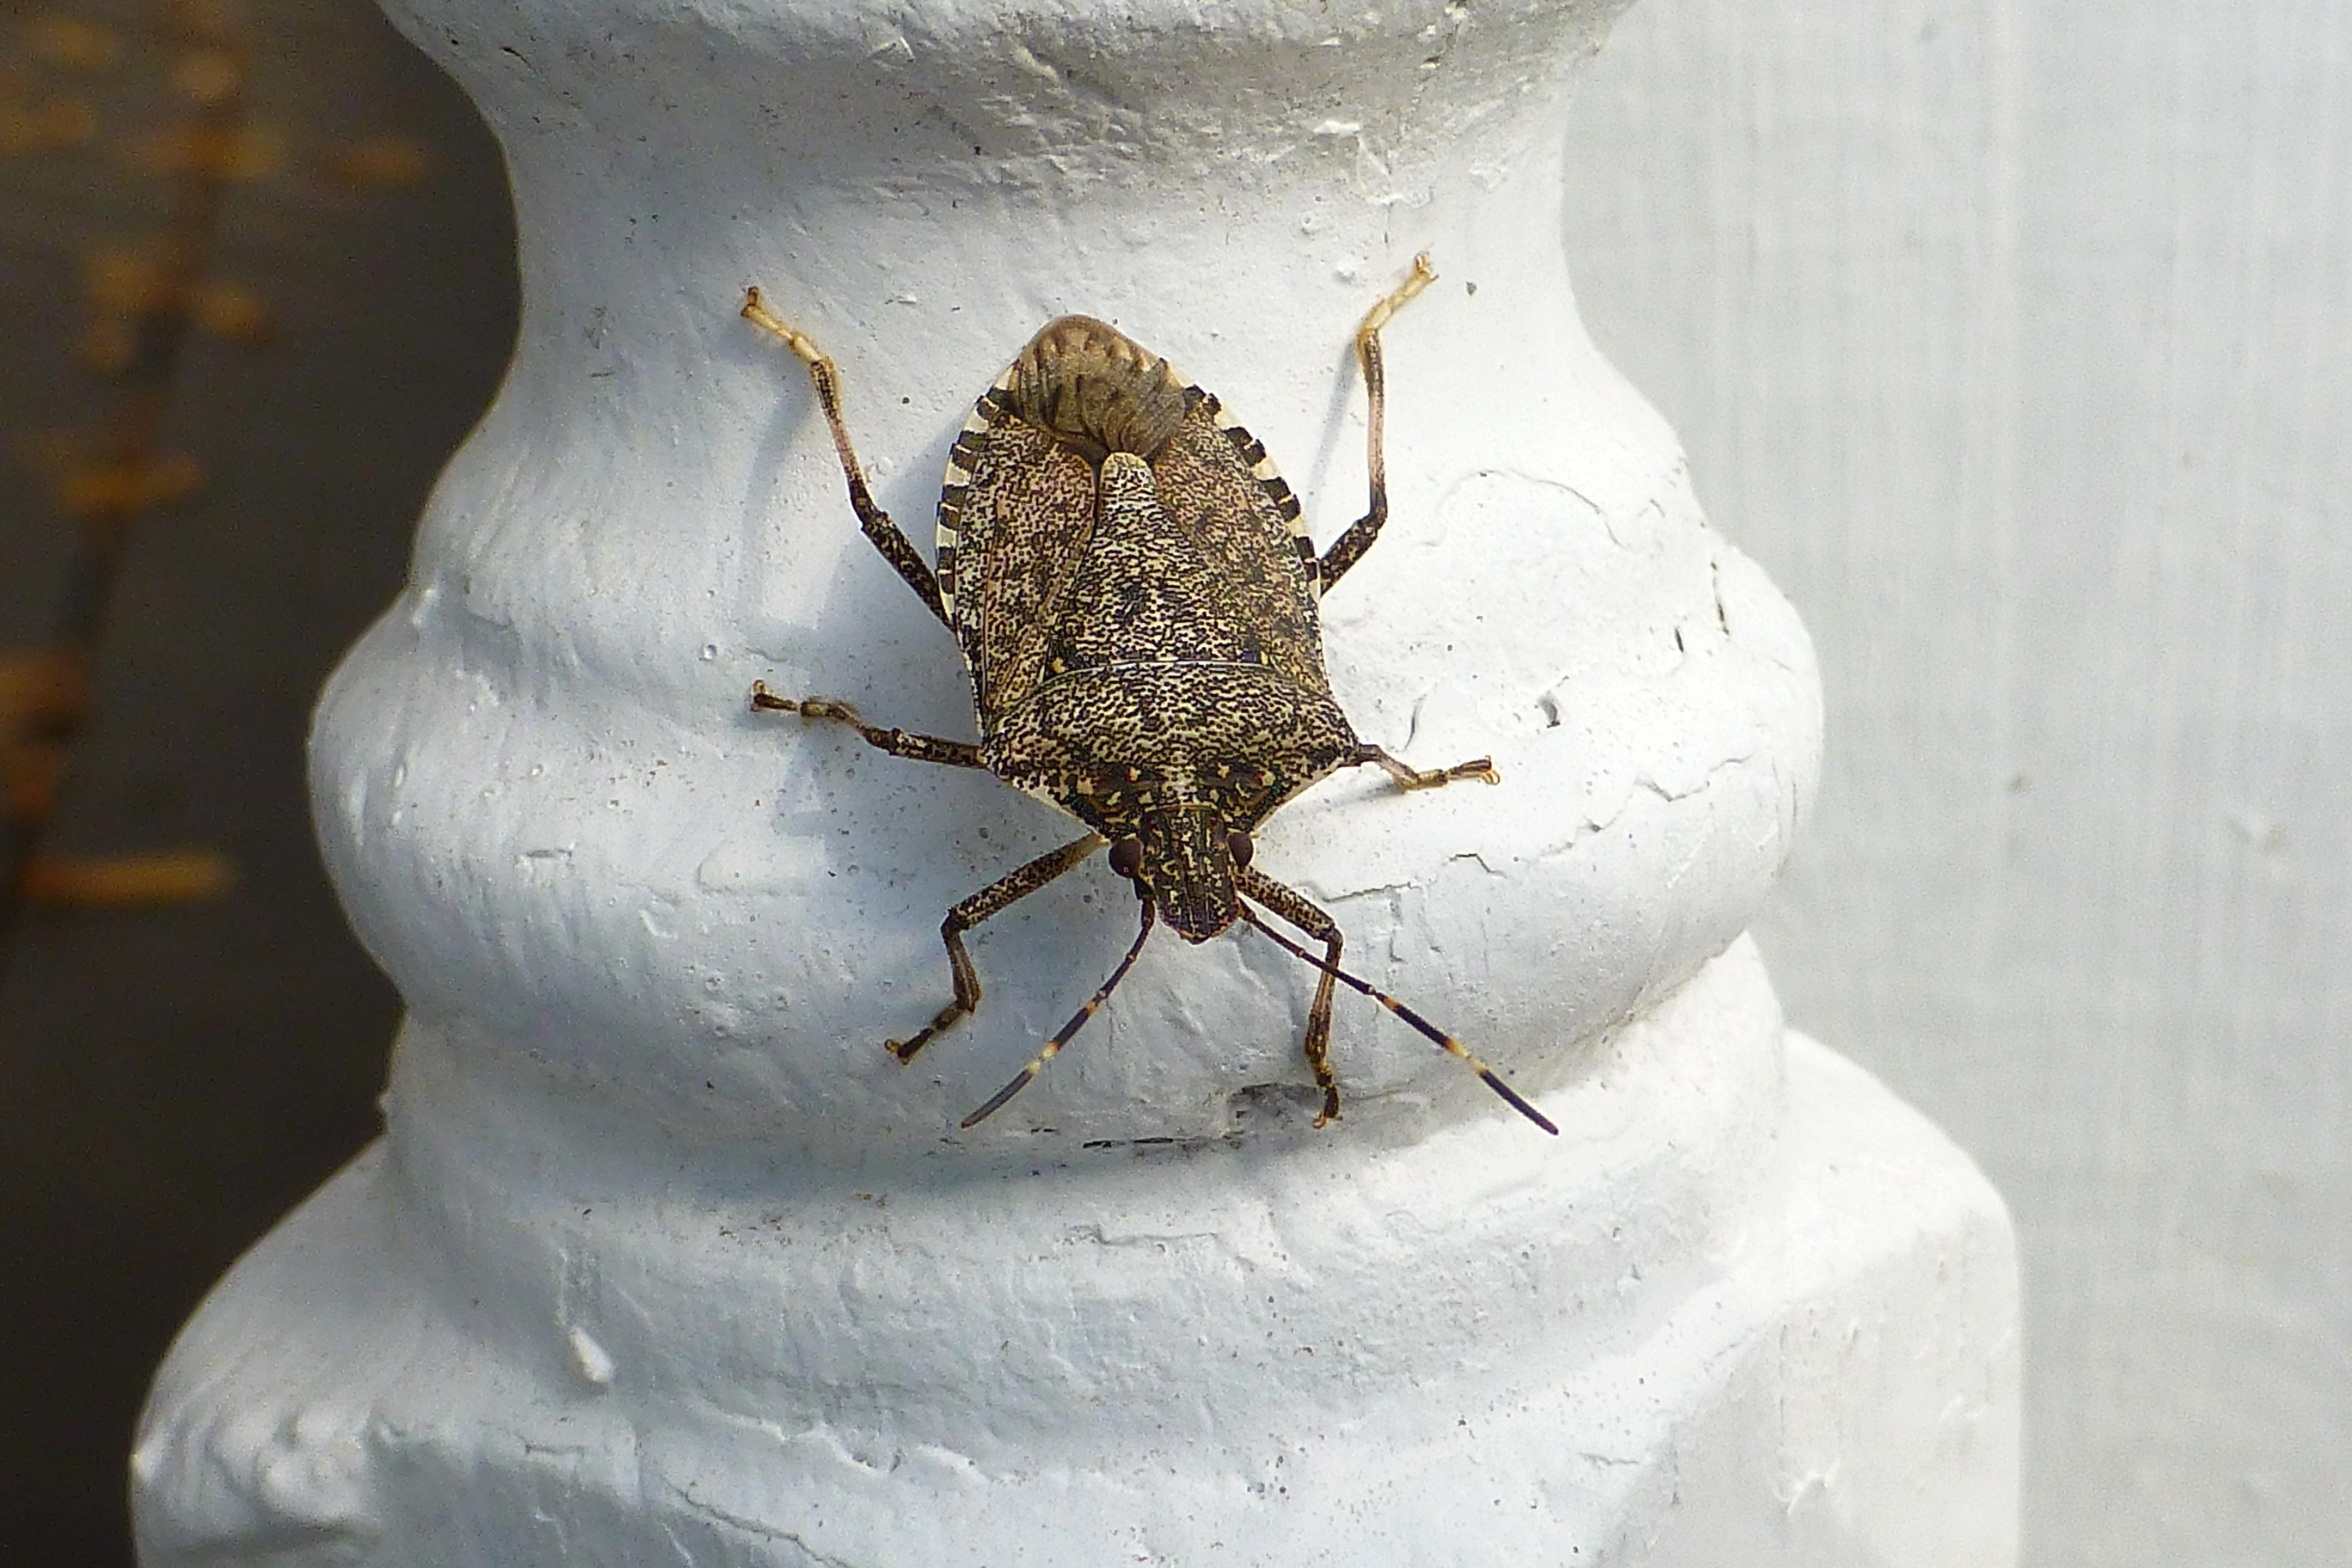 brown-marmorated-stink-bug-on-gazebo-10-21-15-pamm-cooper-photo-2